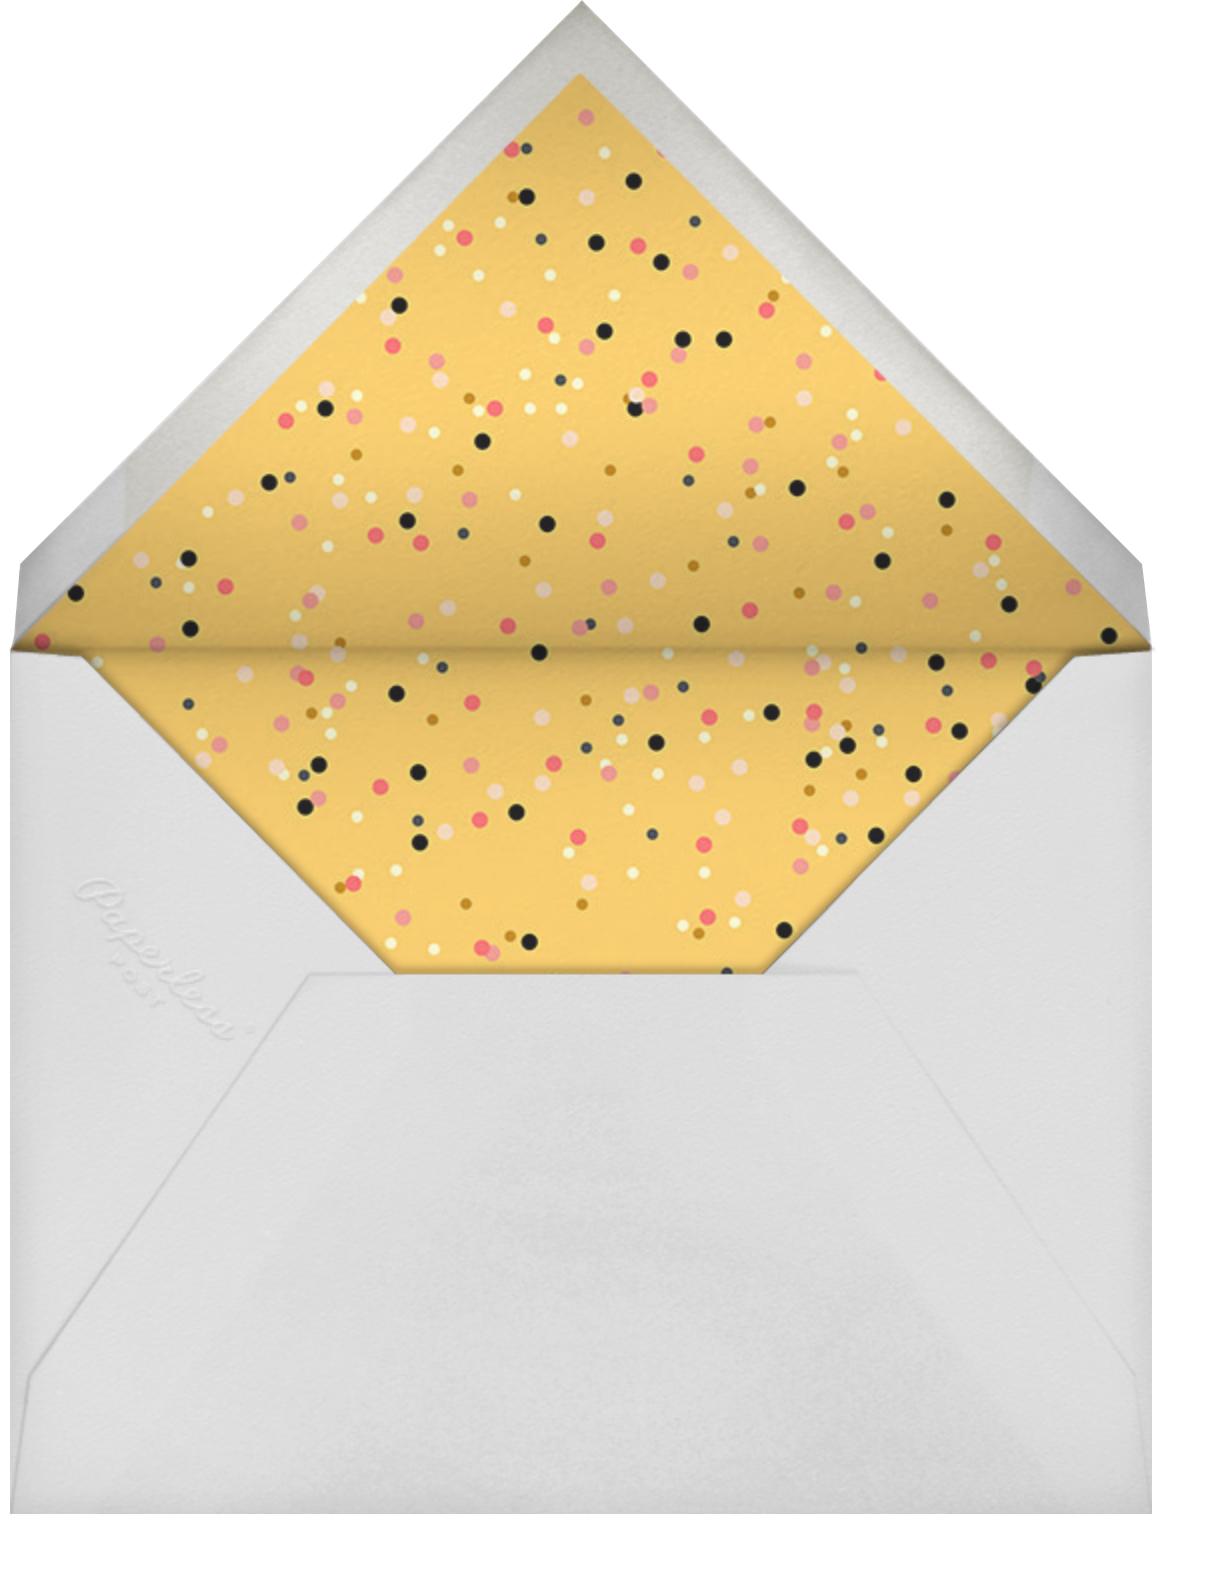 House of Sparks - Black - Paperless Post - Envelope